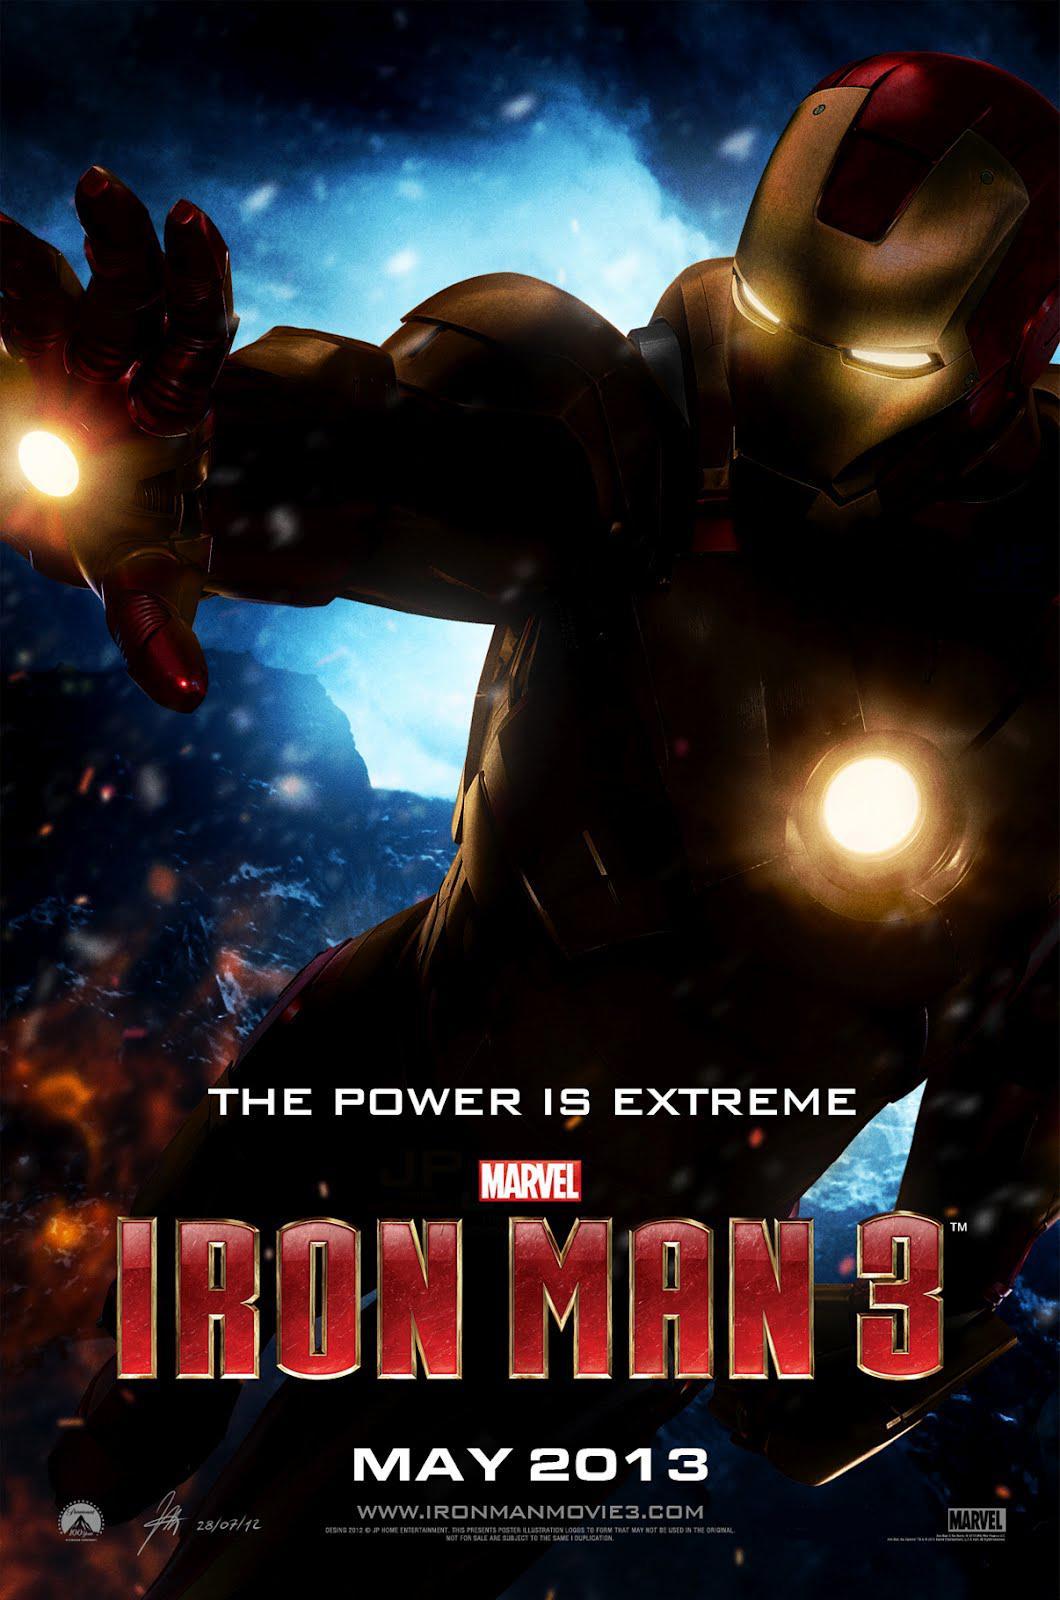 iron man 3 shares character descriptions film enthusiast. Black Bedroom Furniture Sets. Home Design Ideas